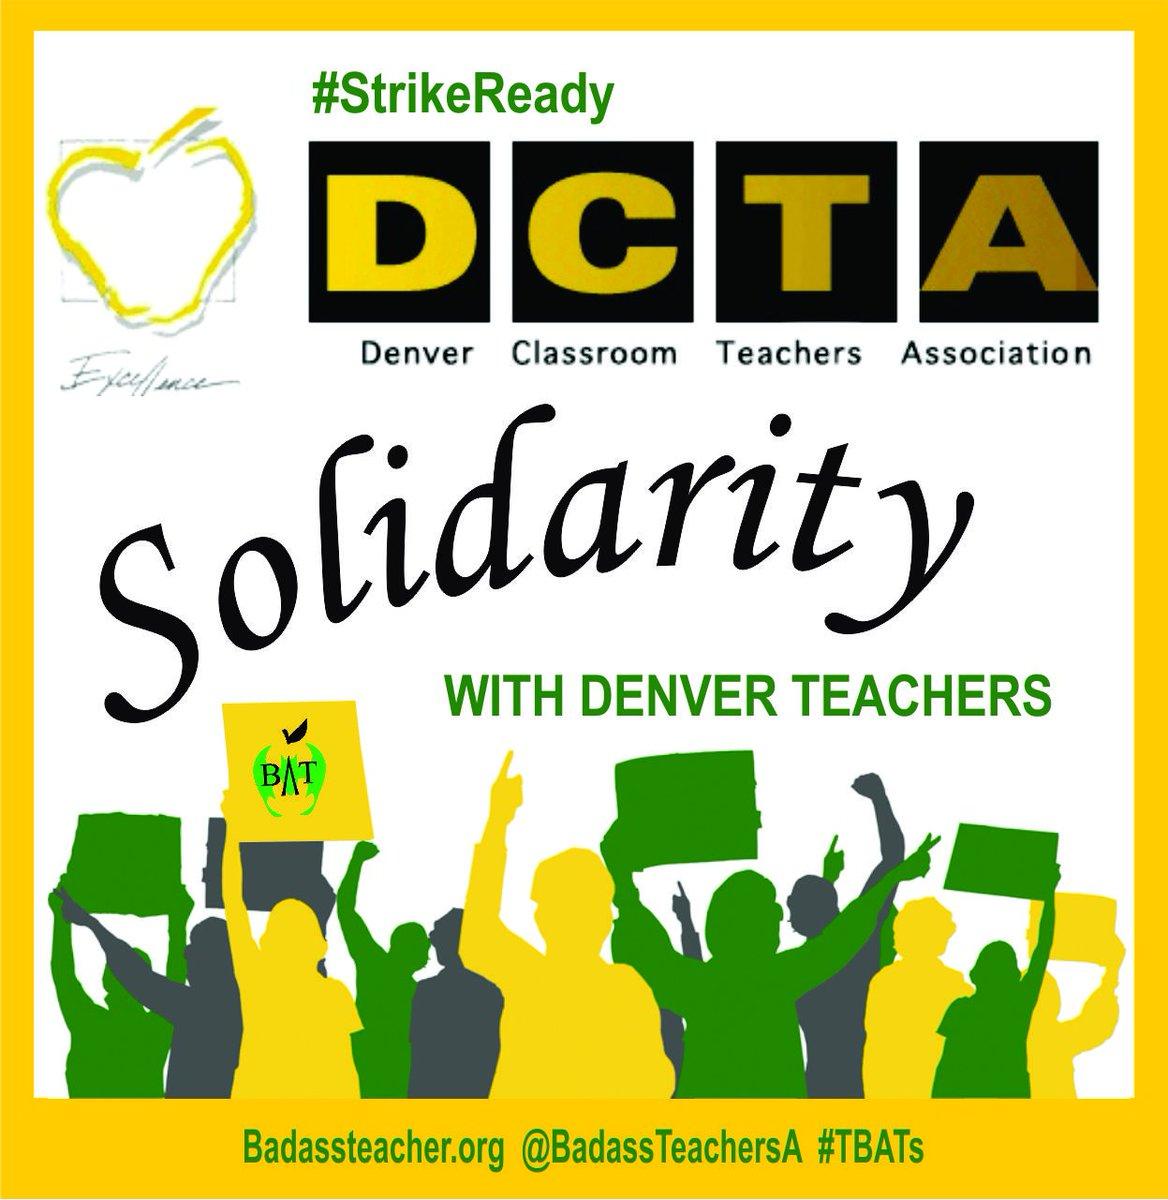 OklahomaBATs's photo on #DenverTeacherStrike